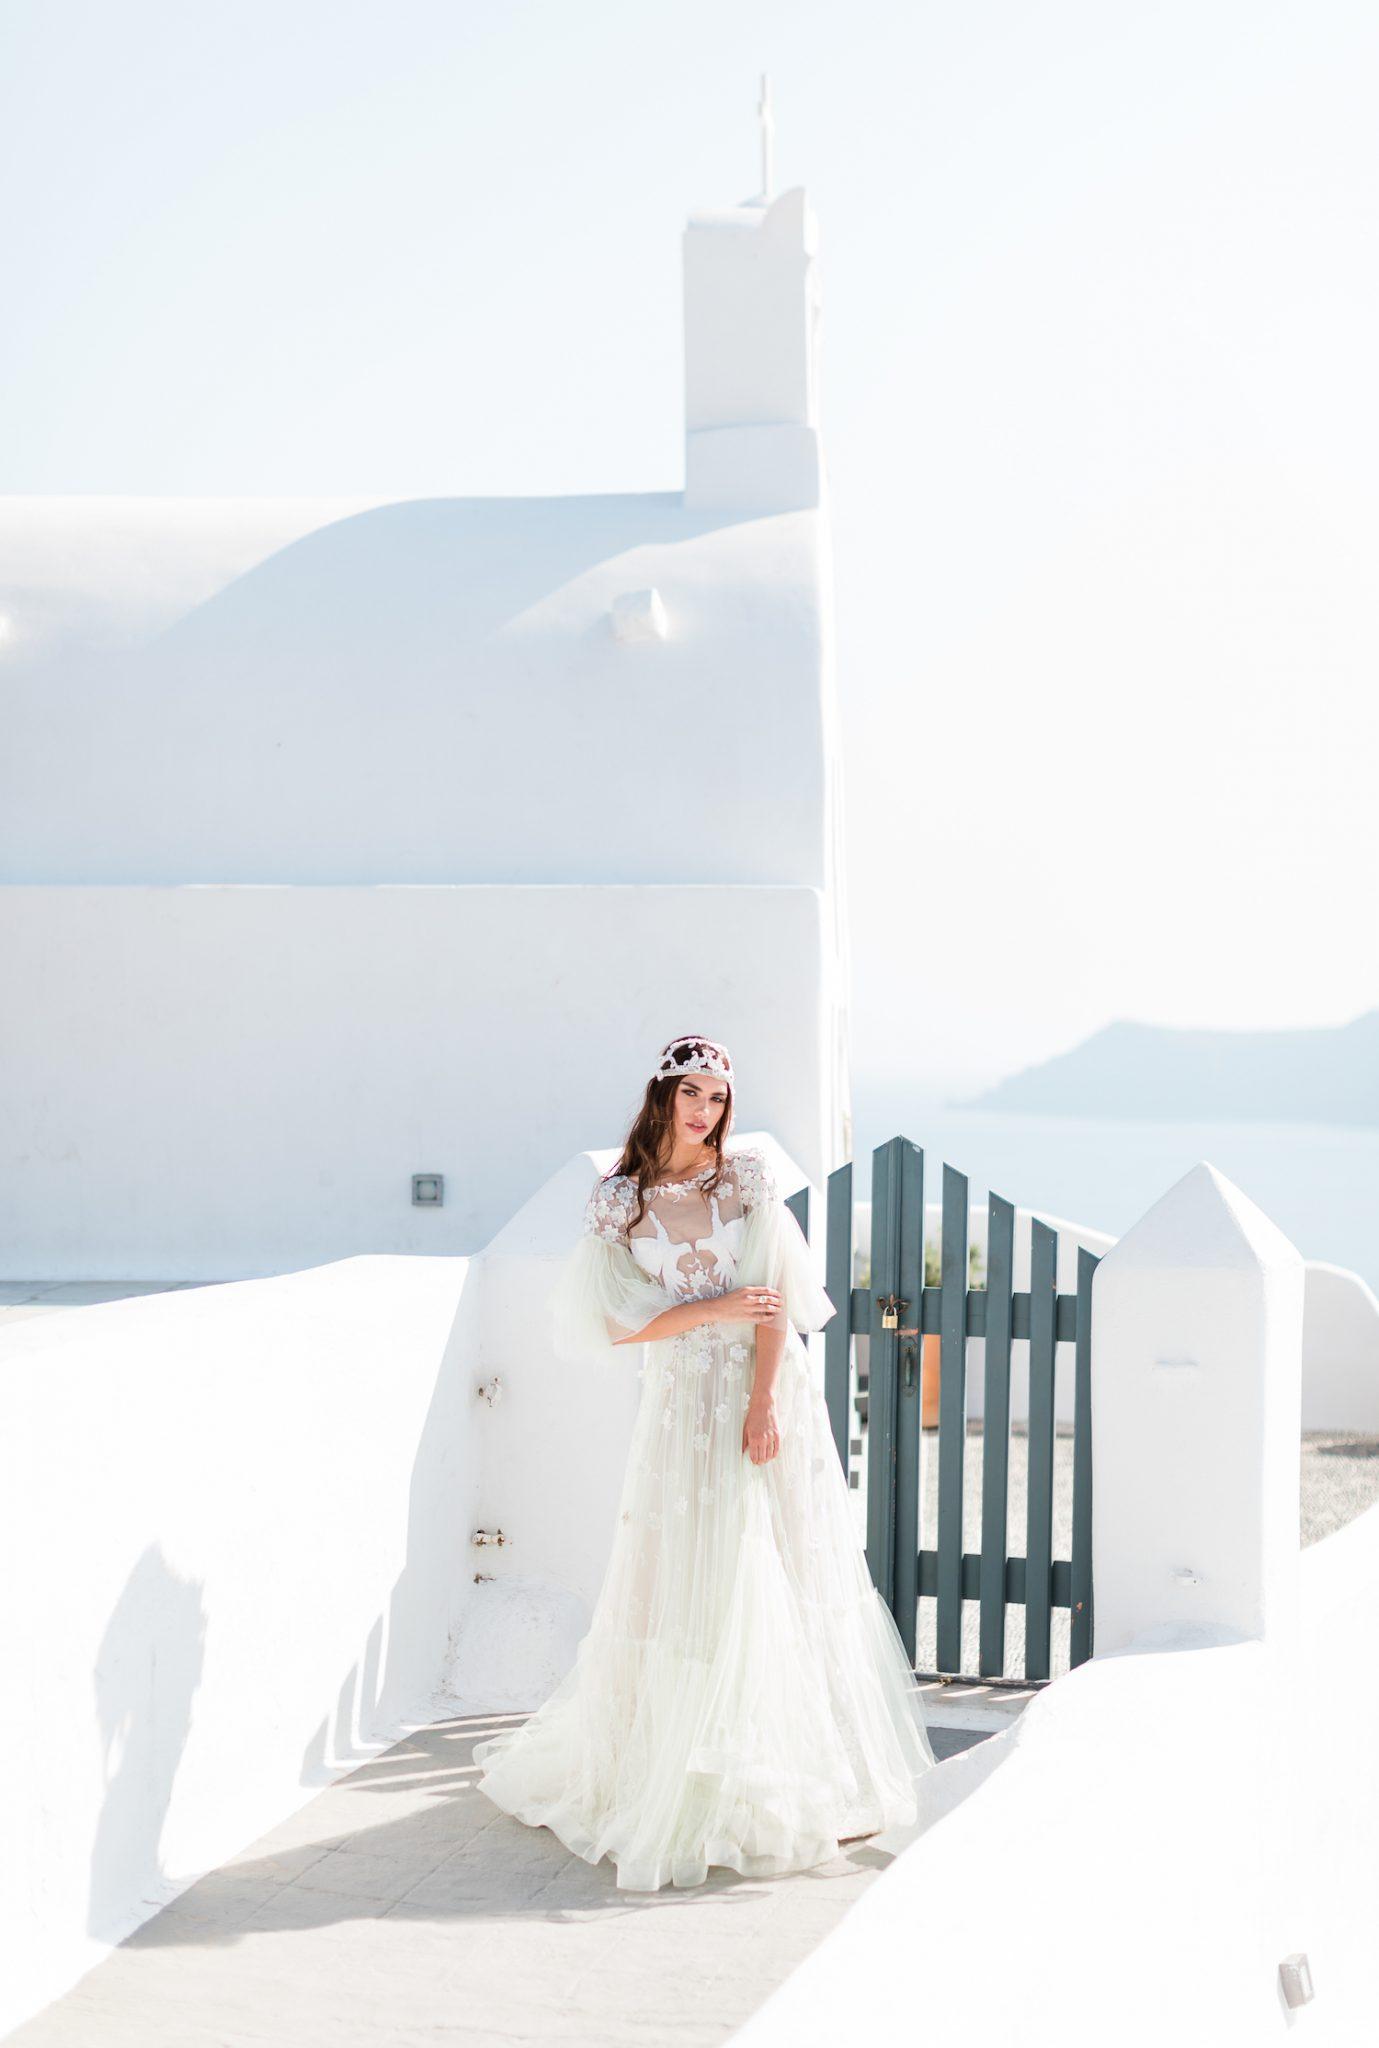 Bröllopsfotograf, Anete Bruzan, Boho bröllop